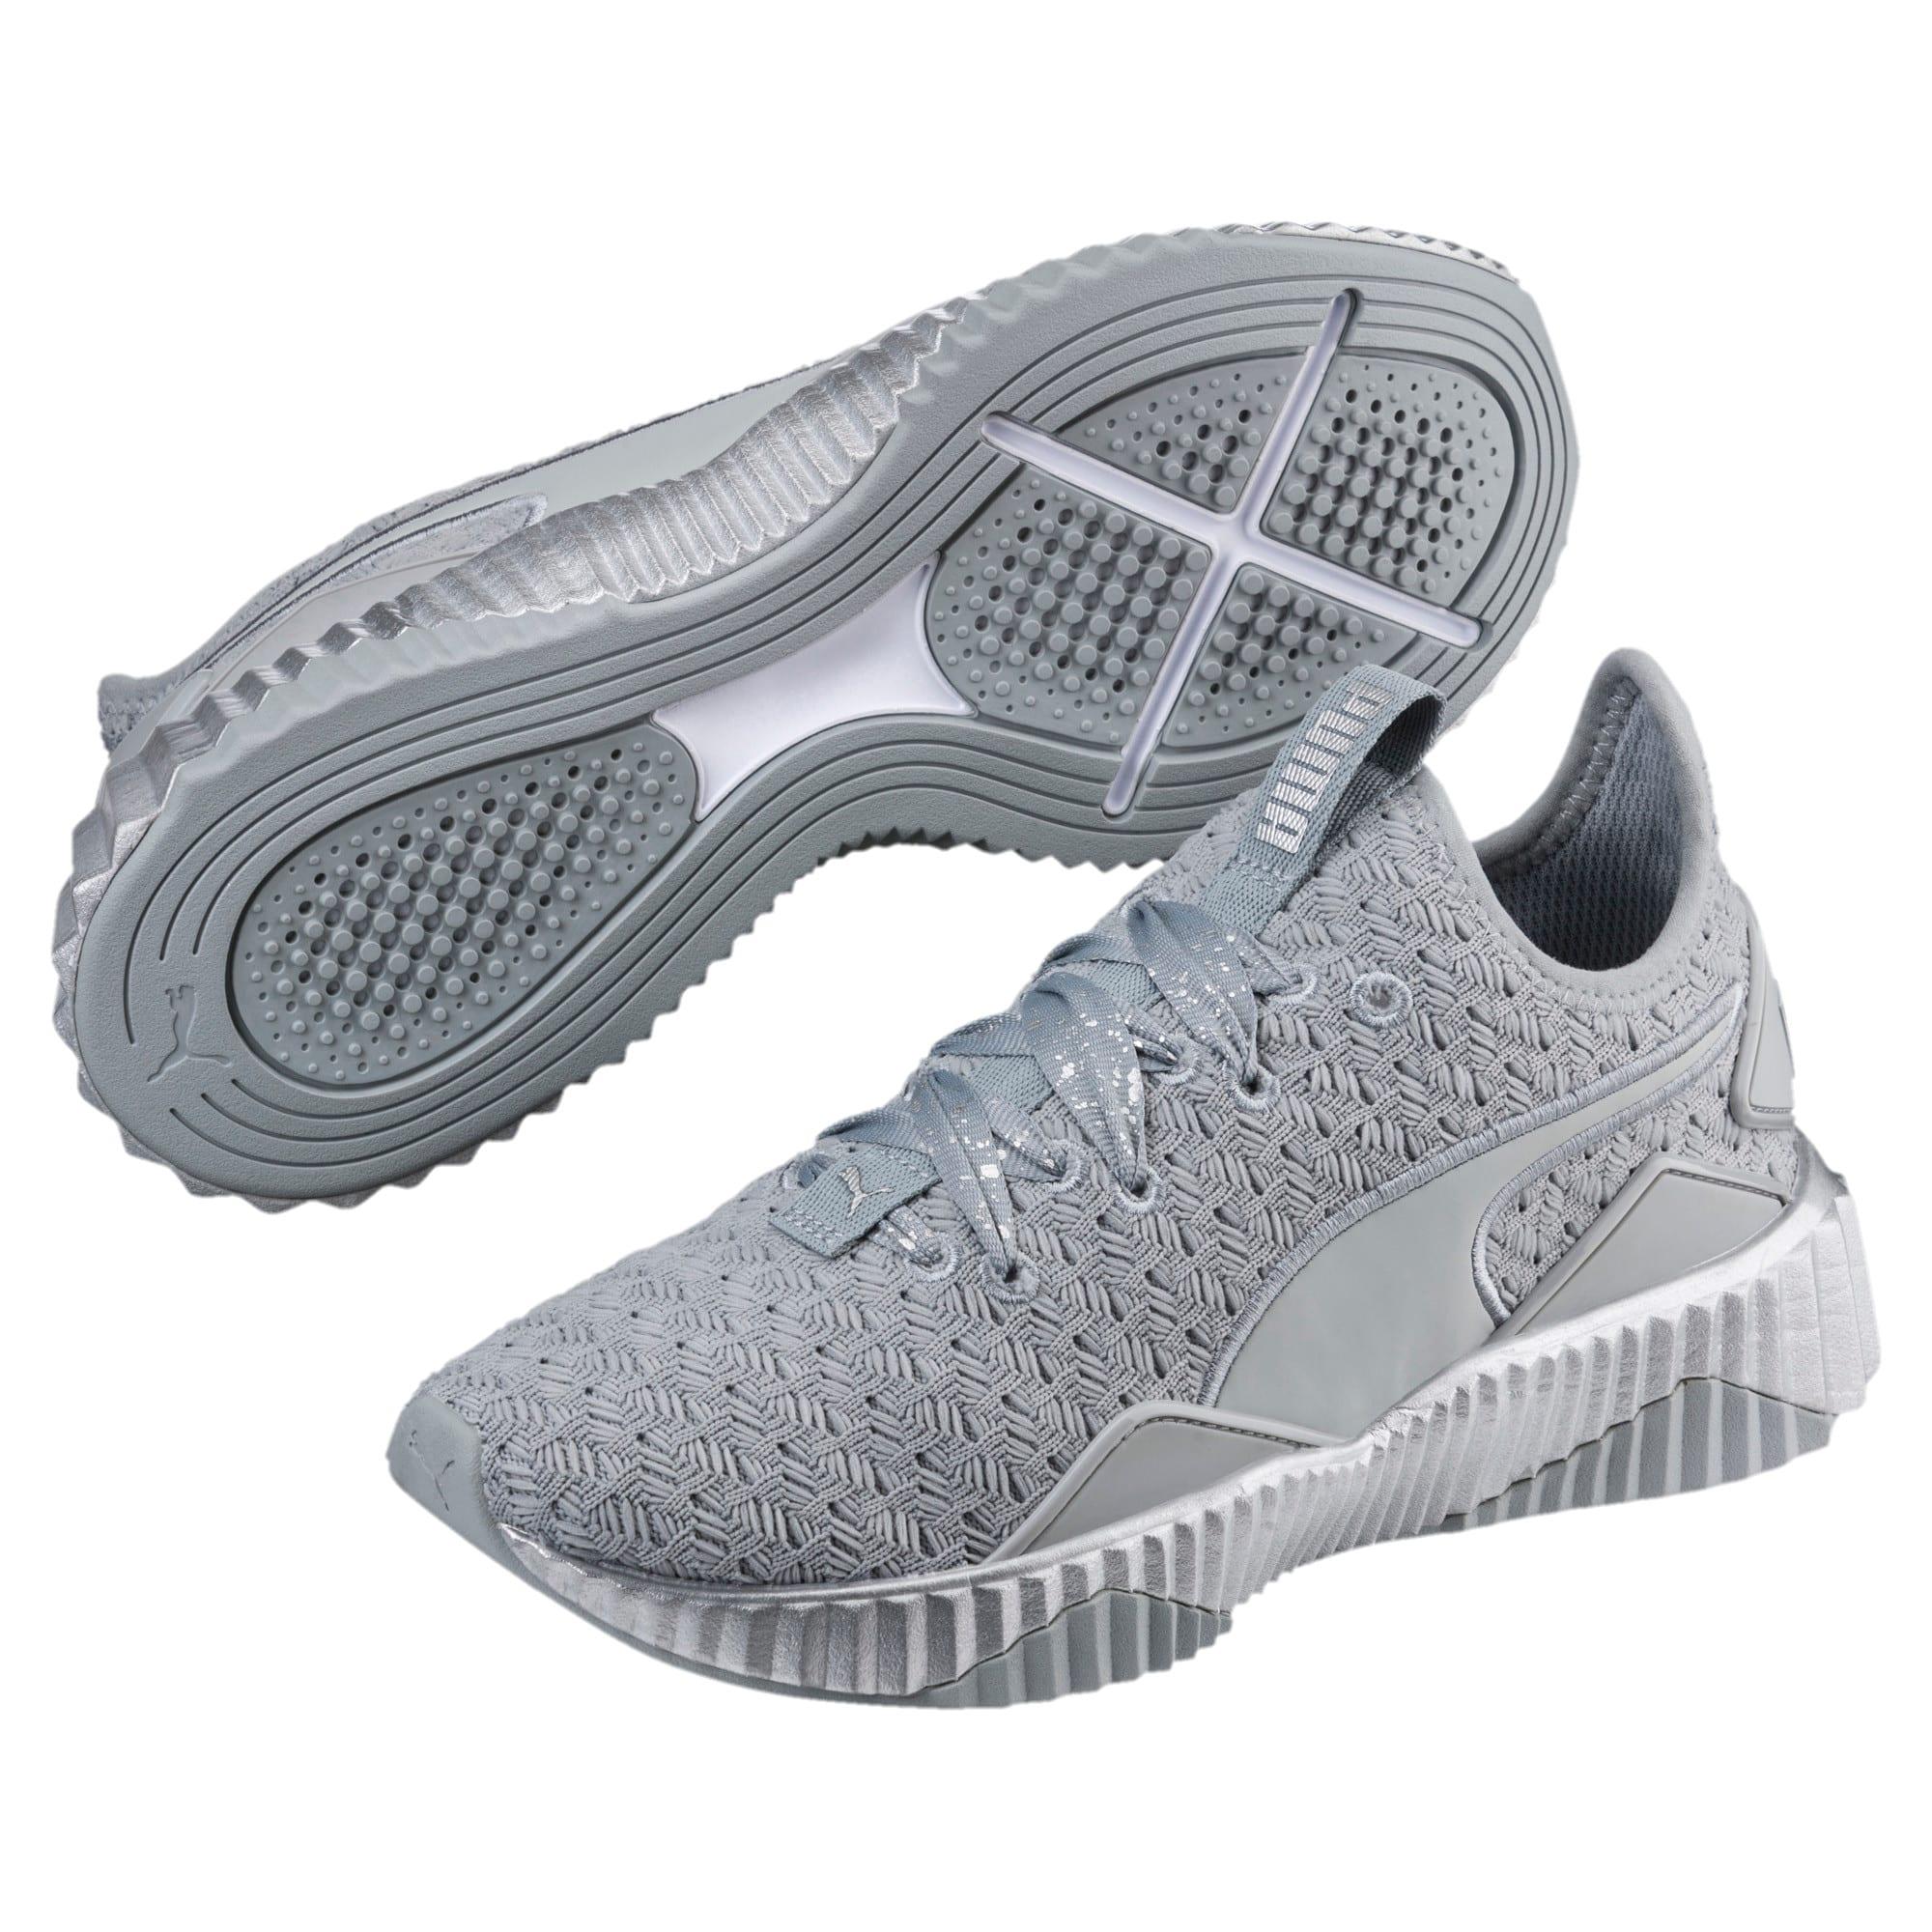 Thumbnail 2 of Defy Sparkle Women's Training Shoes, Quarry-Puma Silver, medium